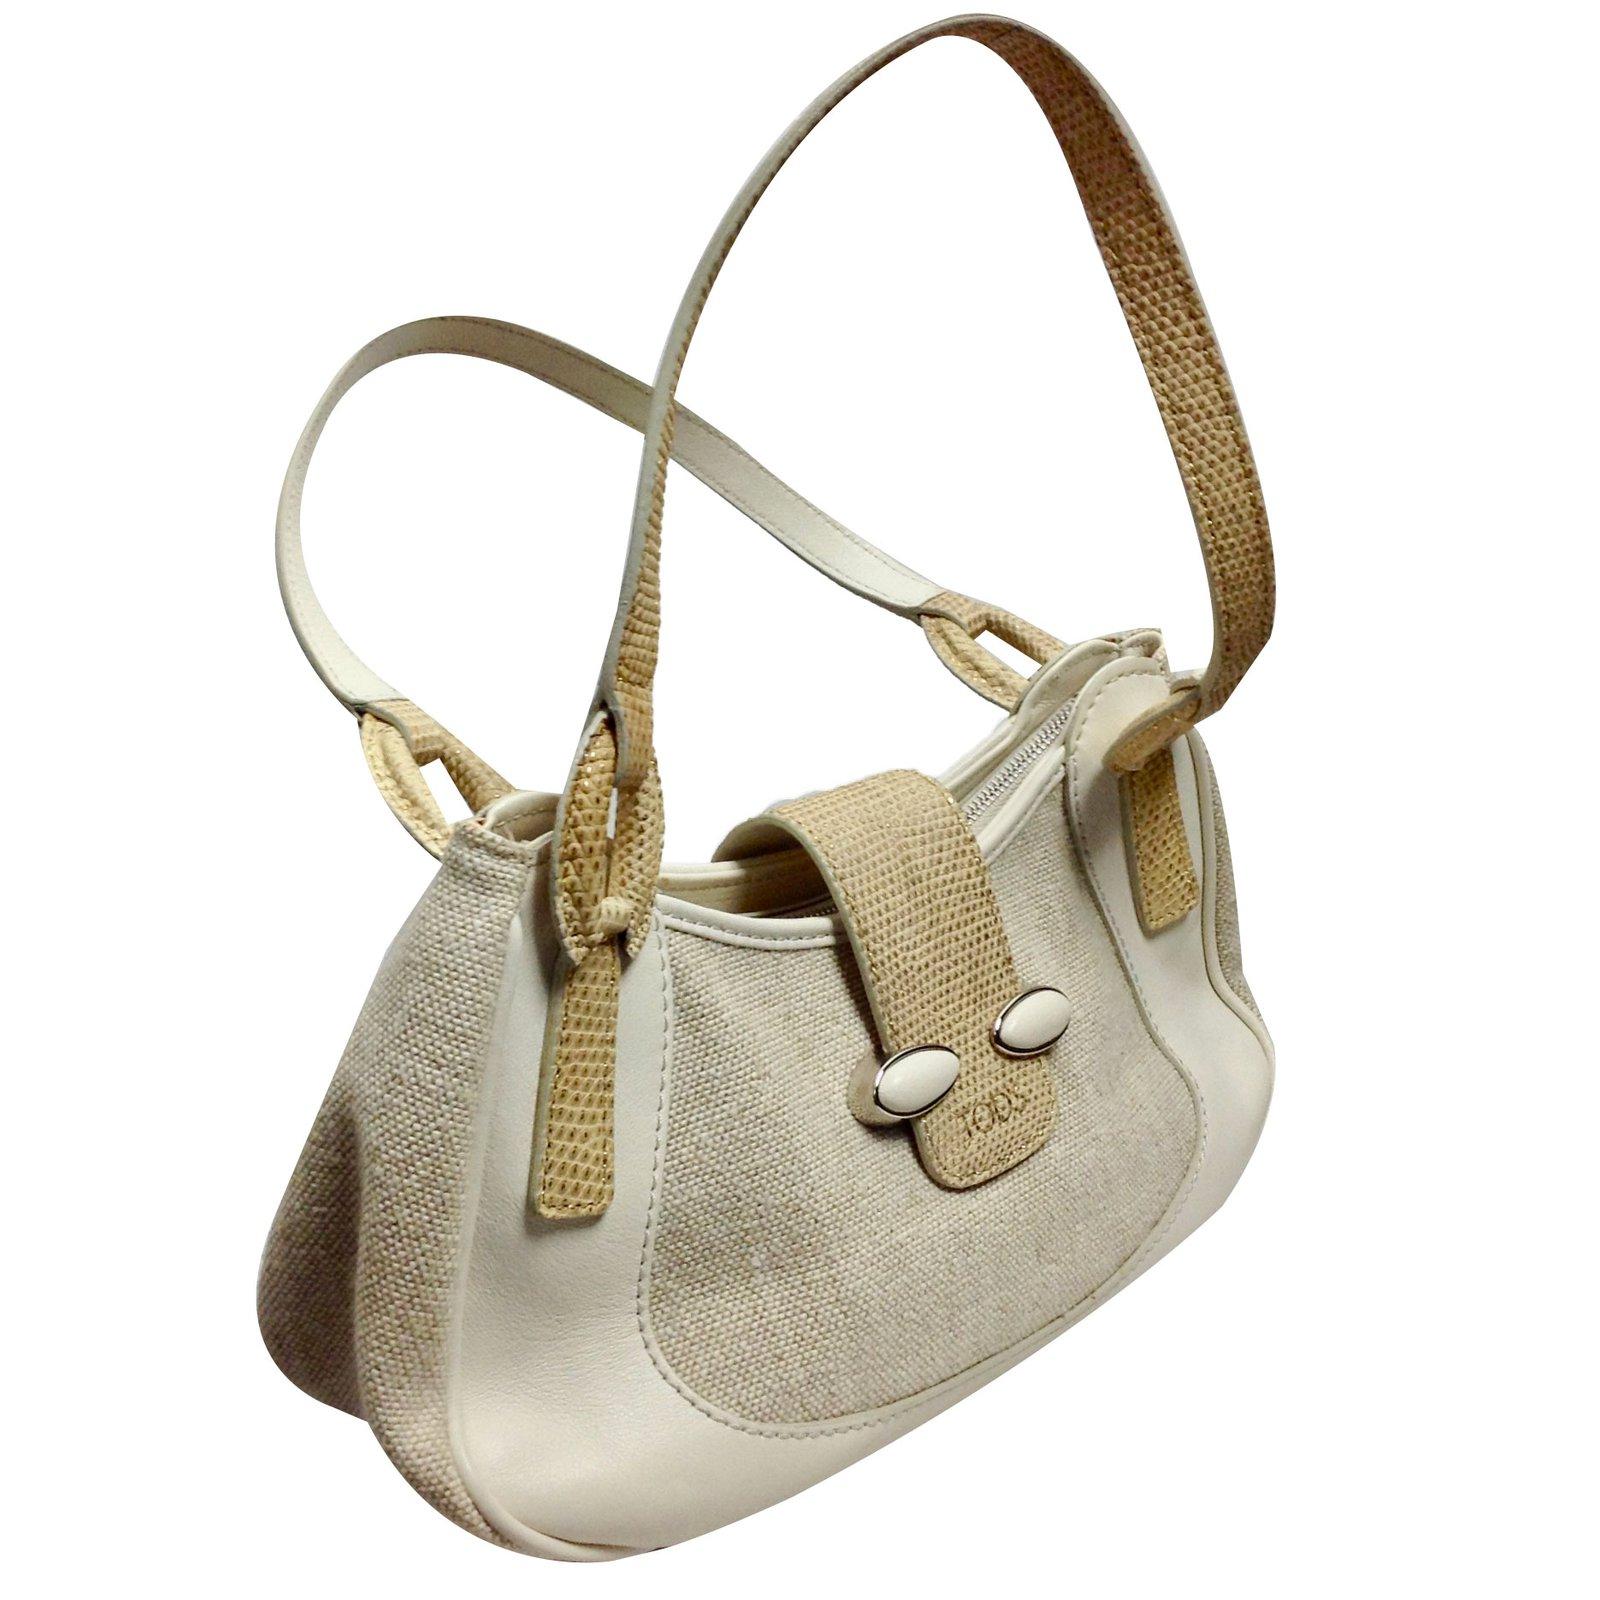 543ea1f9515da Tods Beige Leather Handbag